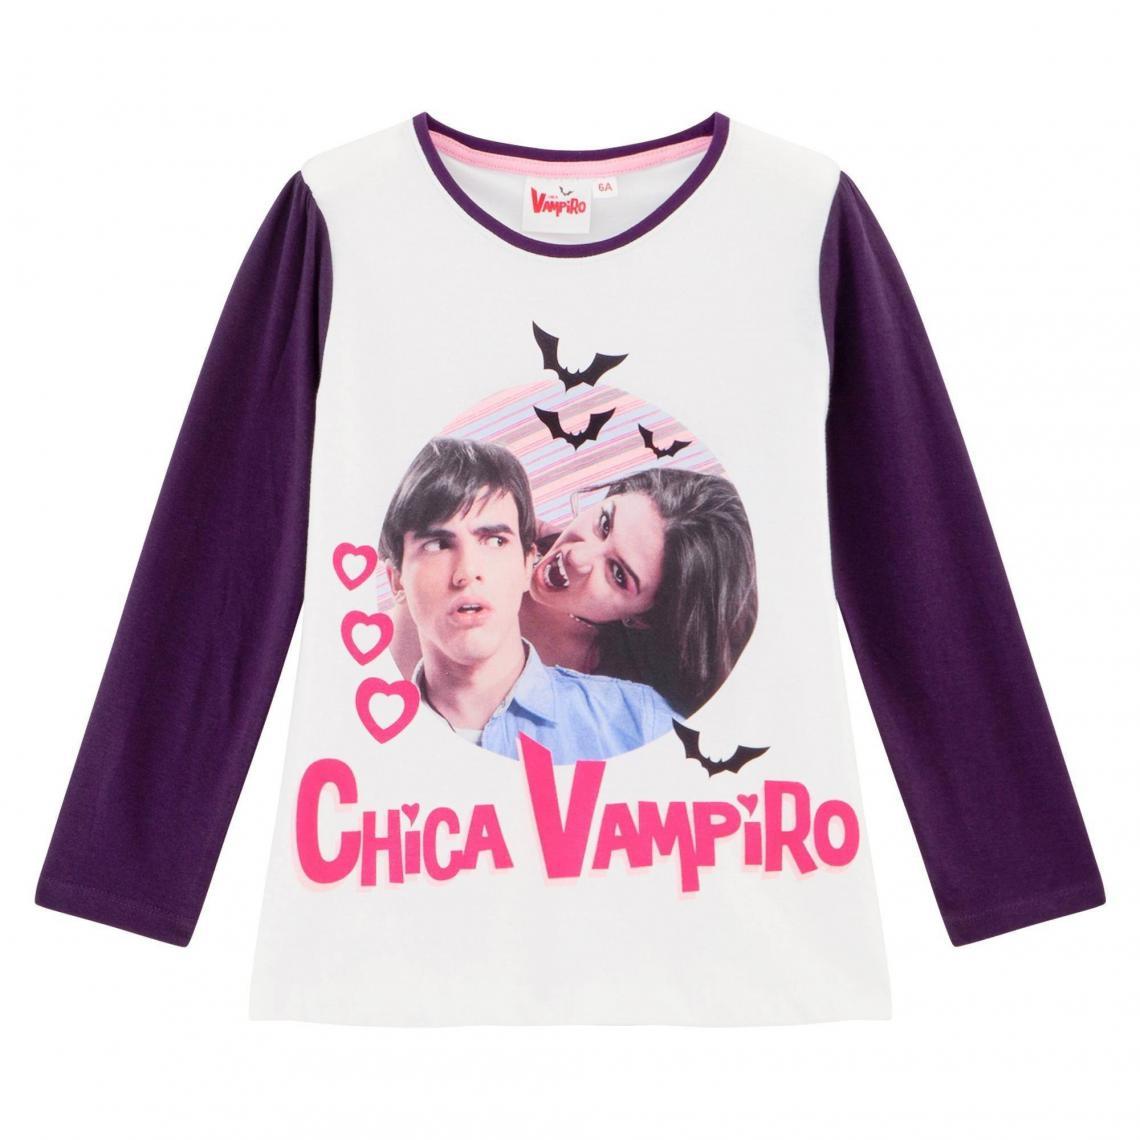 61ed27ef1a1c5 Pyjama fille imprimé Chica Vampiro - Violet